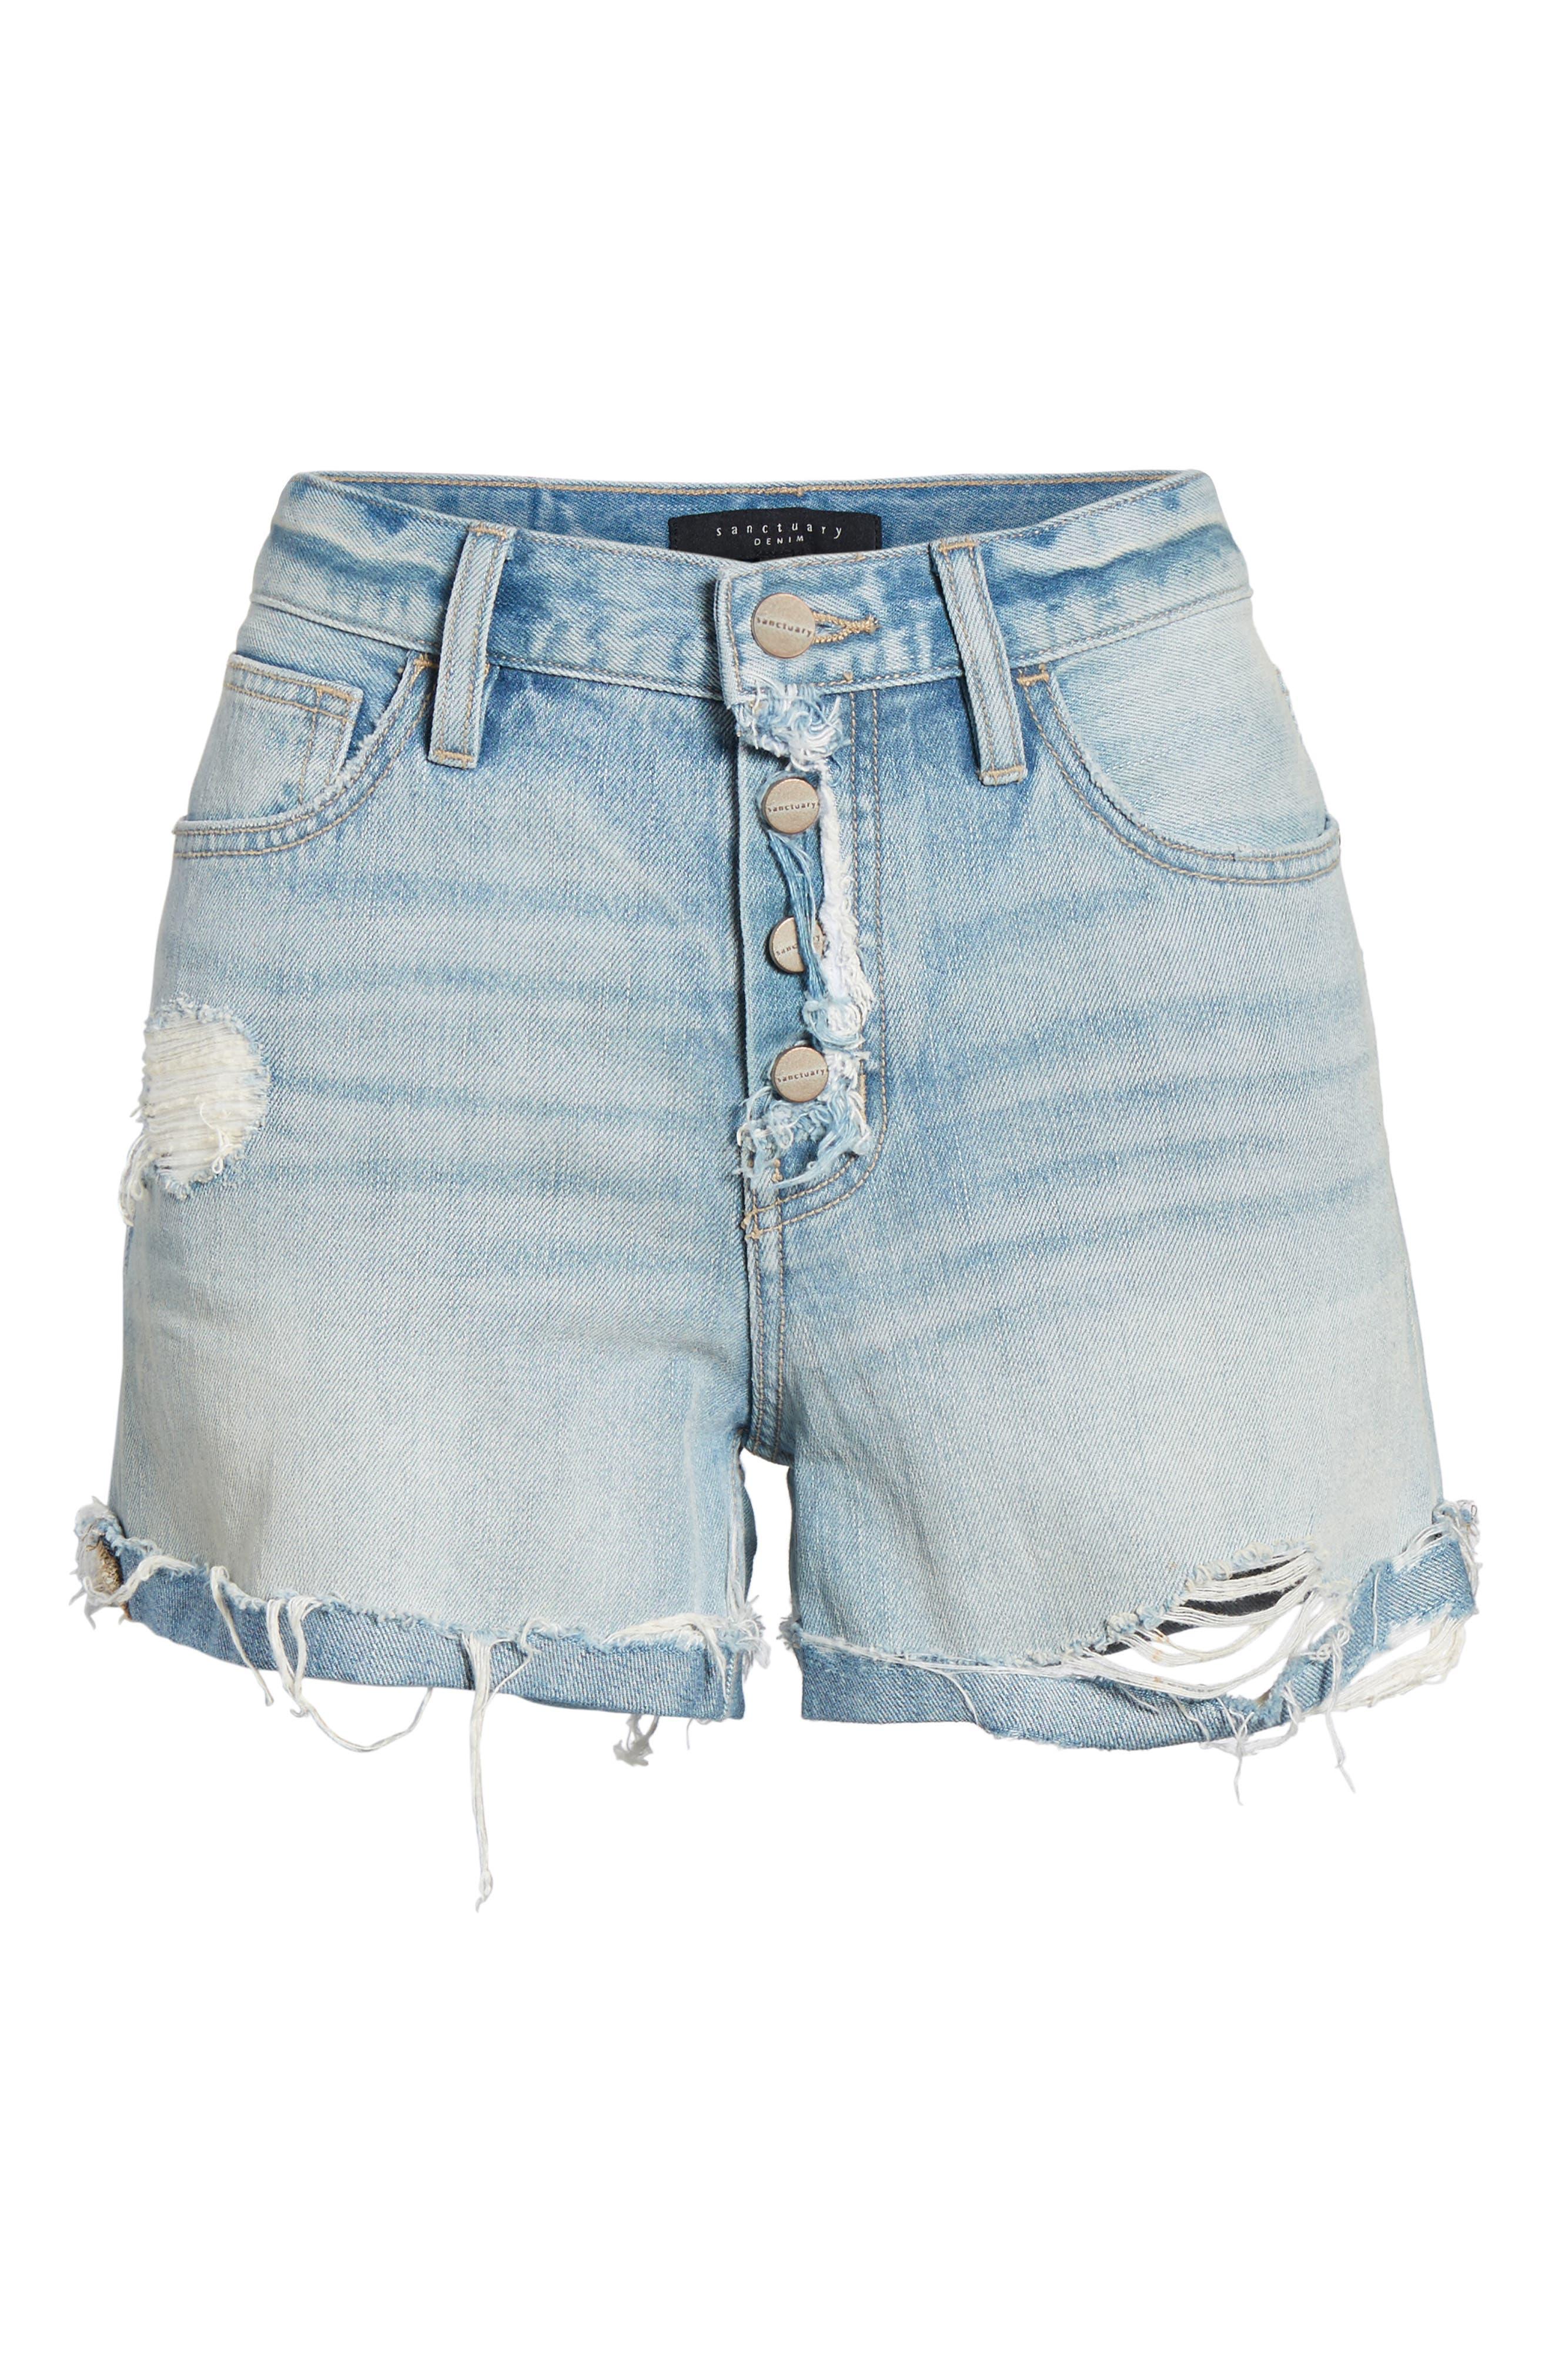 Distressed Fray Hem Rolled Shorts,                             Alternate thumbnail 7, color,                             Olivia Wash